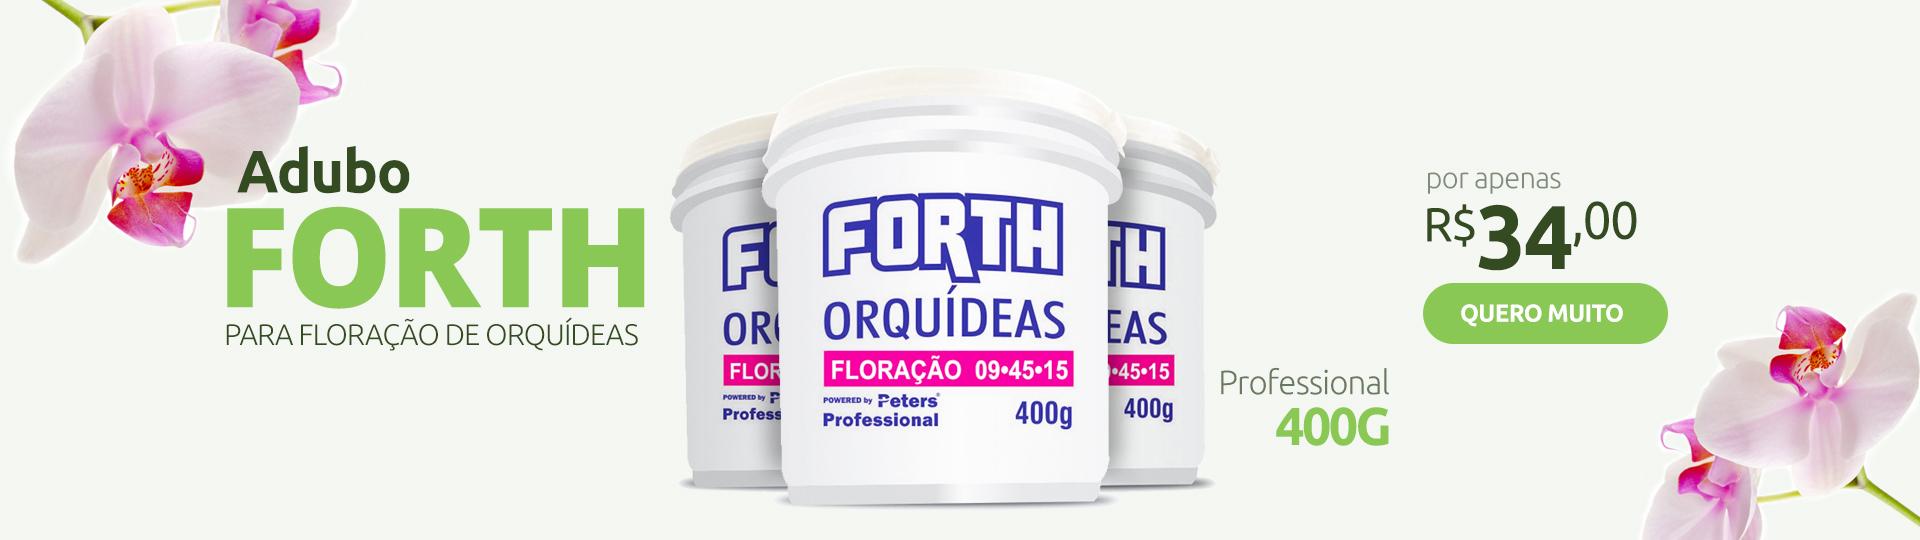 ADUBO FORTH ORQUÍDEAS